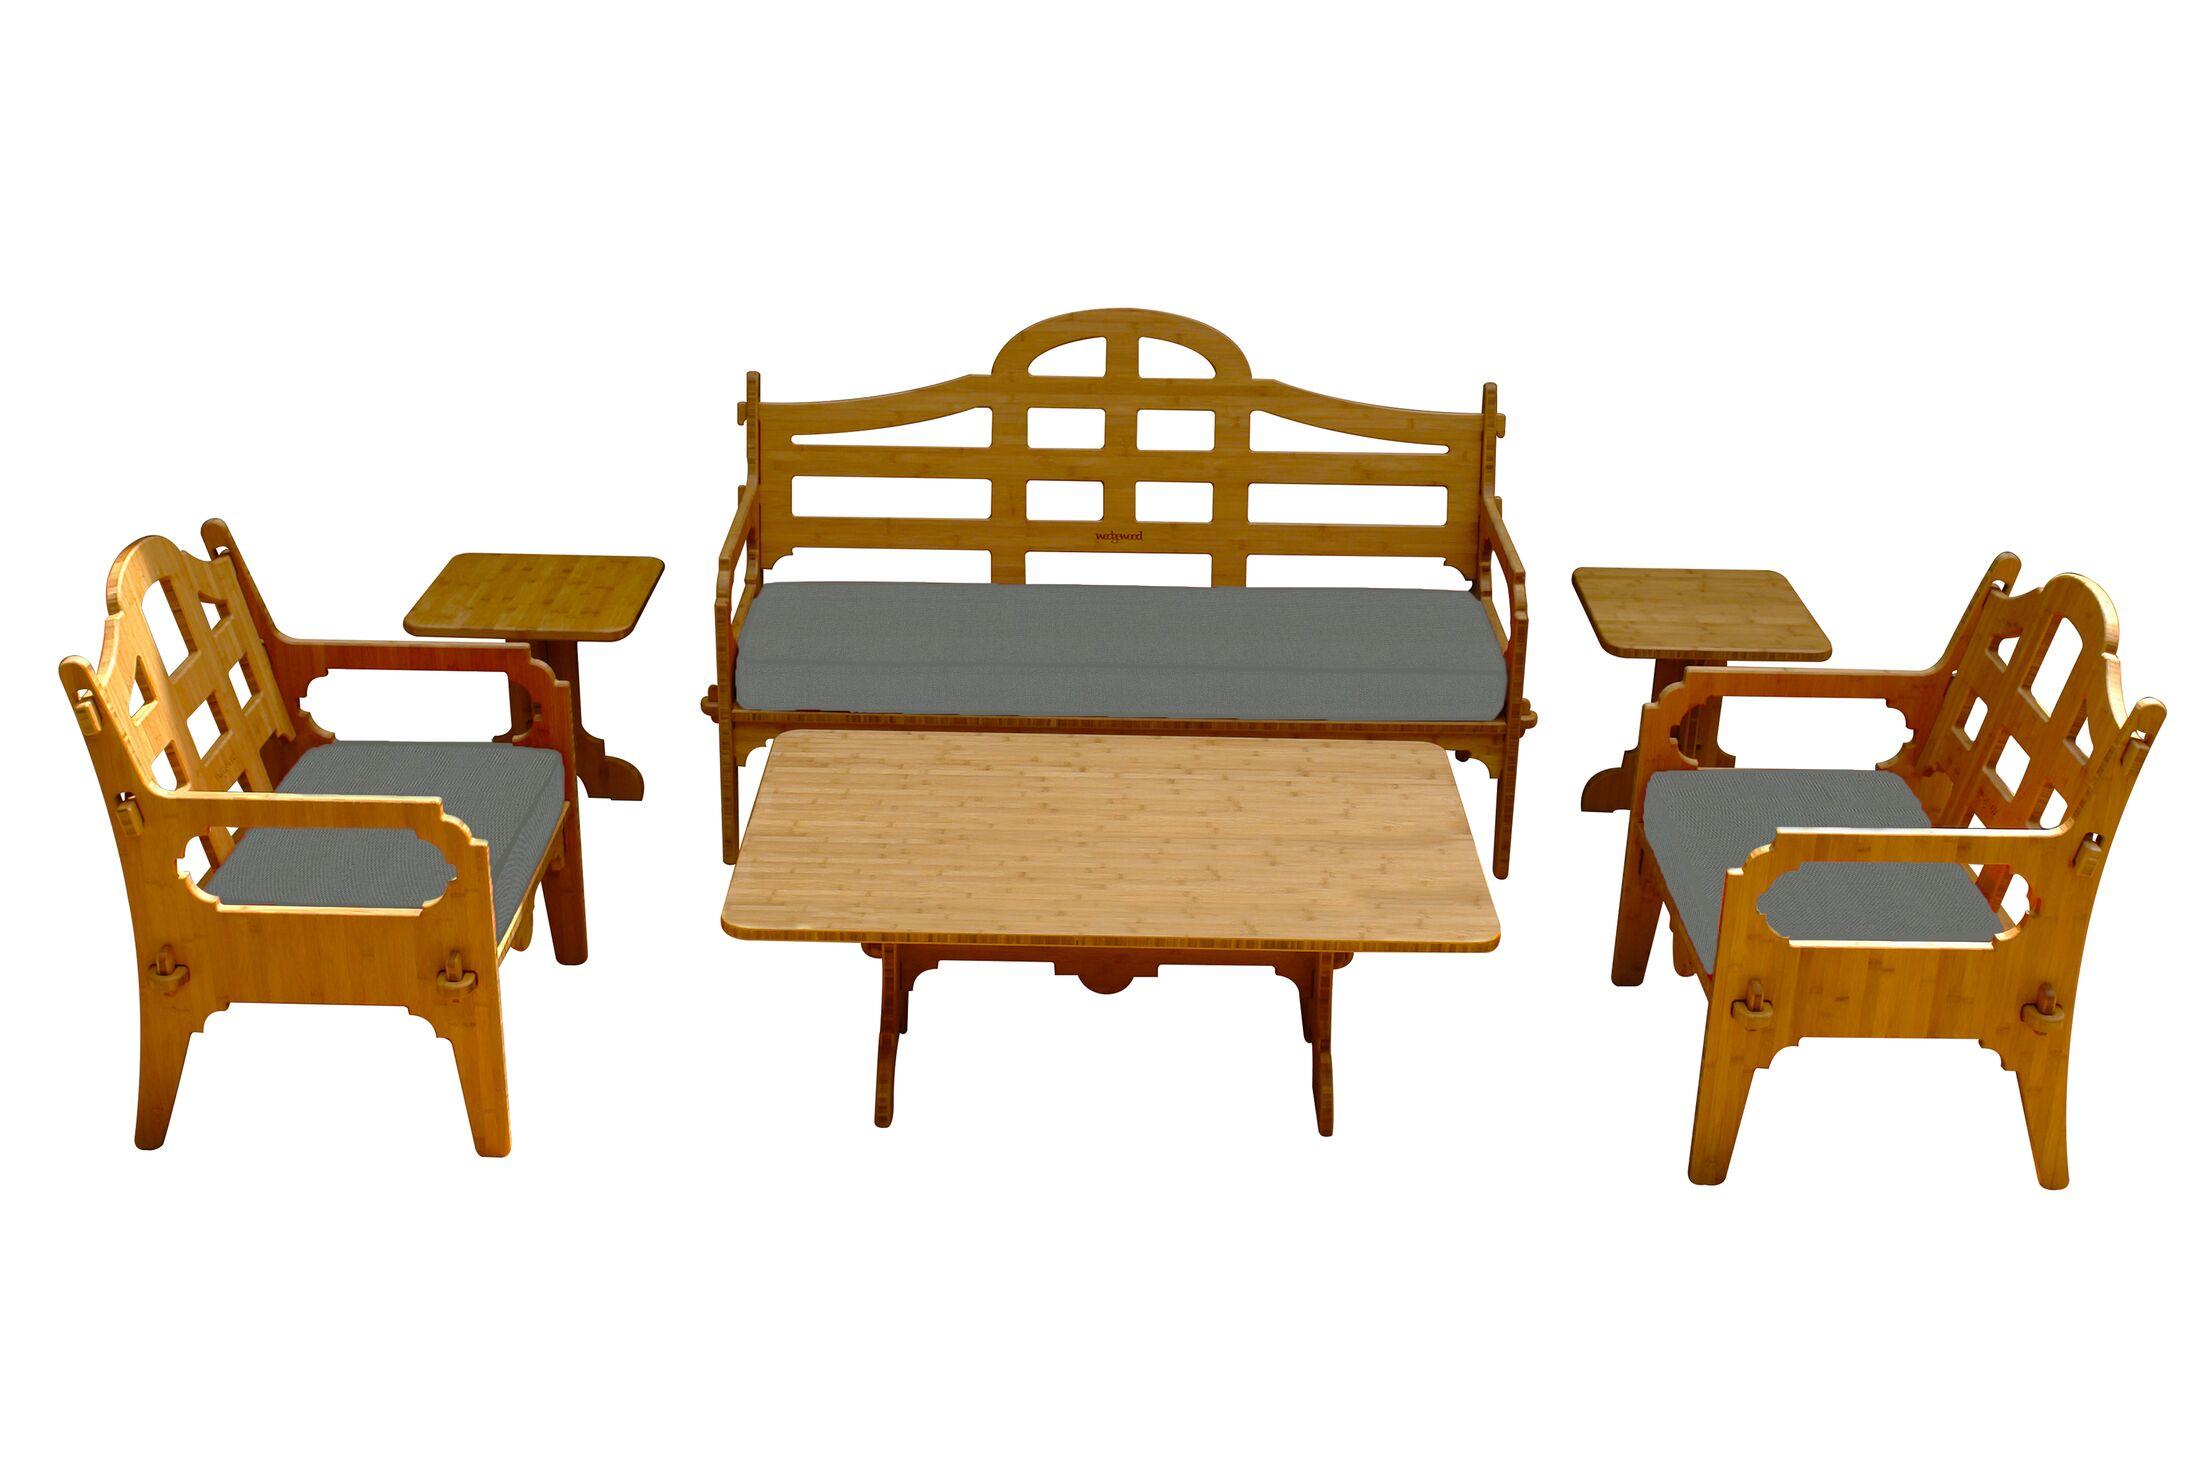 Burliegh 6 Piece Sunbrella Sofa Set with Cushions Fabric: Charcoal